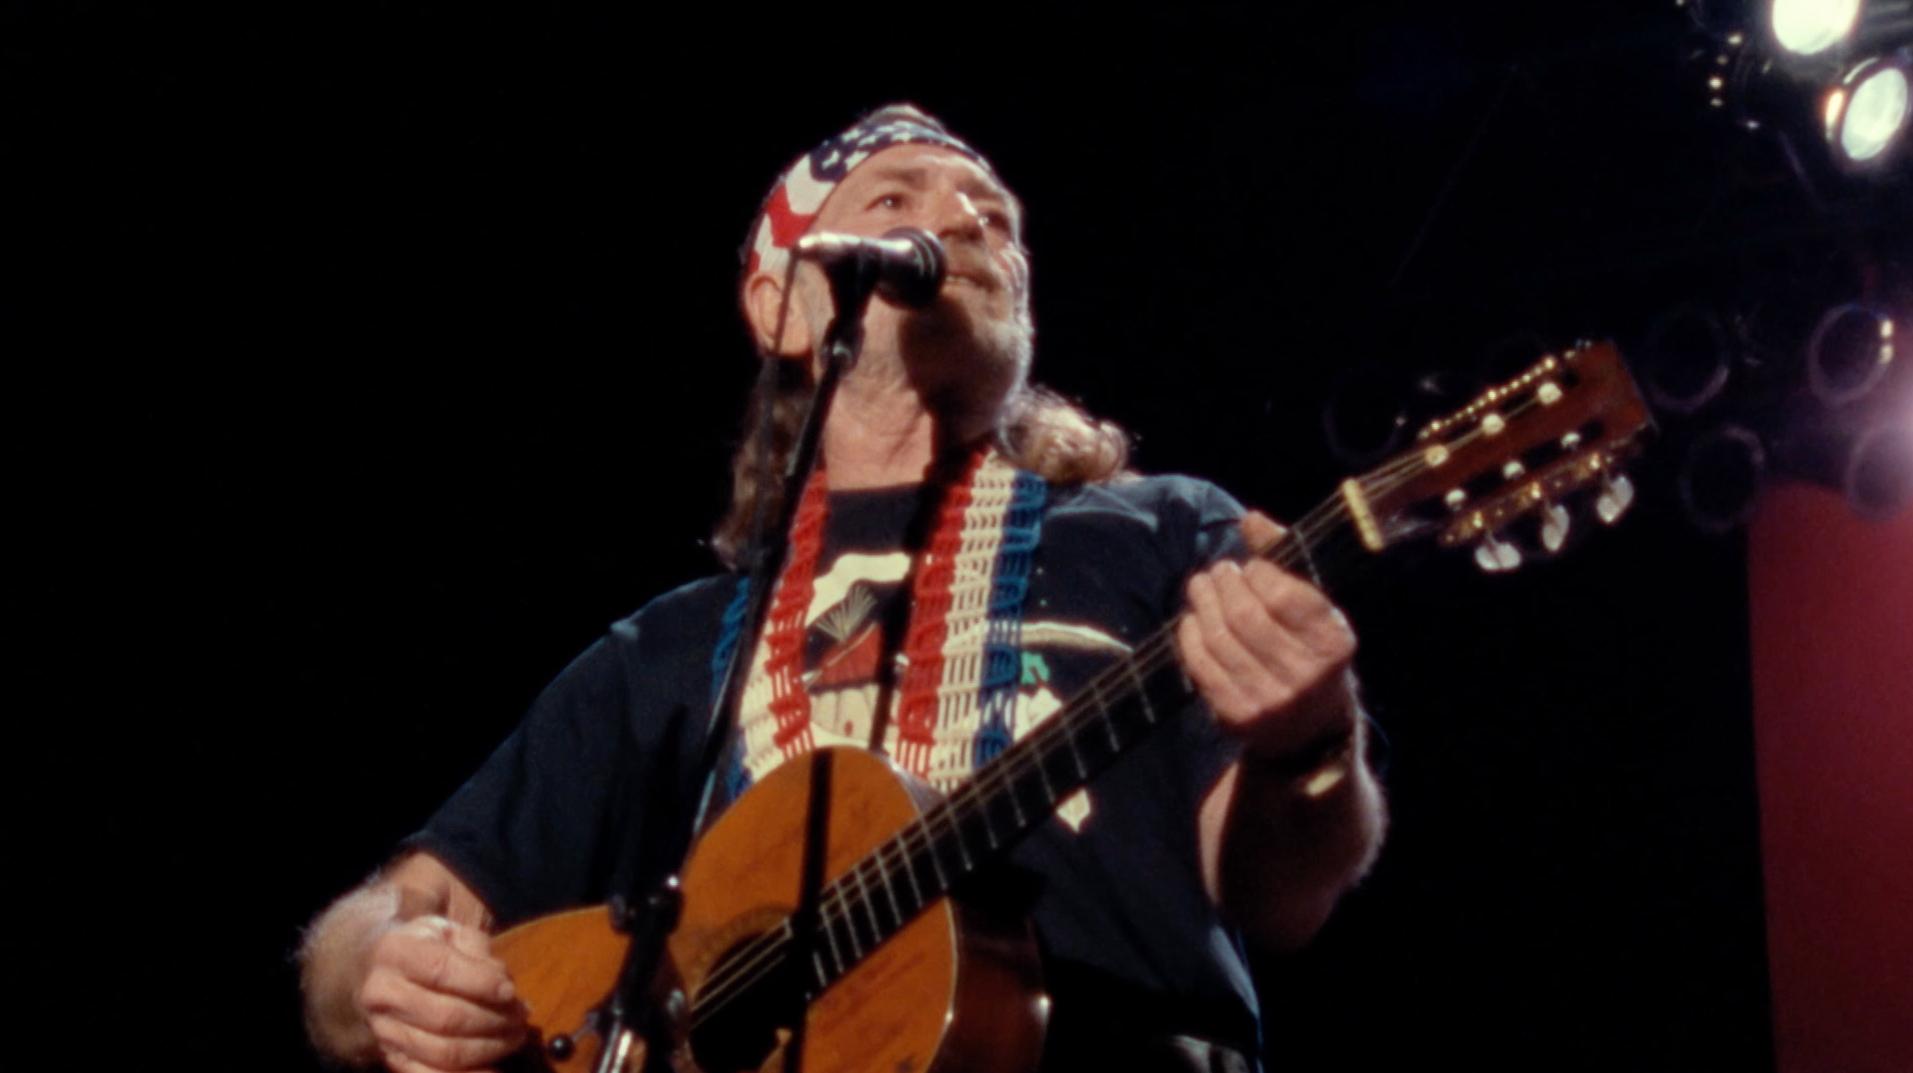 Willie Nelson Sings 'Always On My Mind' at Nassau Coliseum